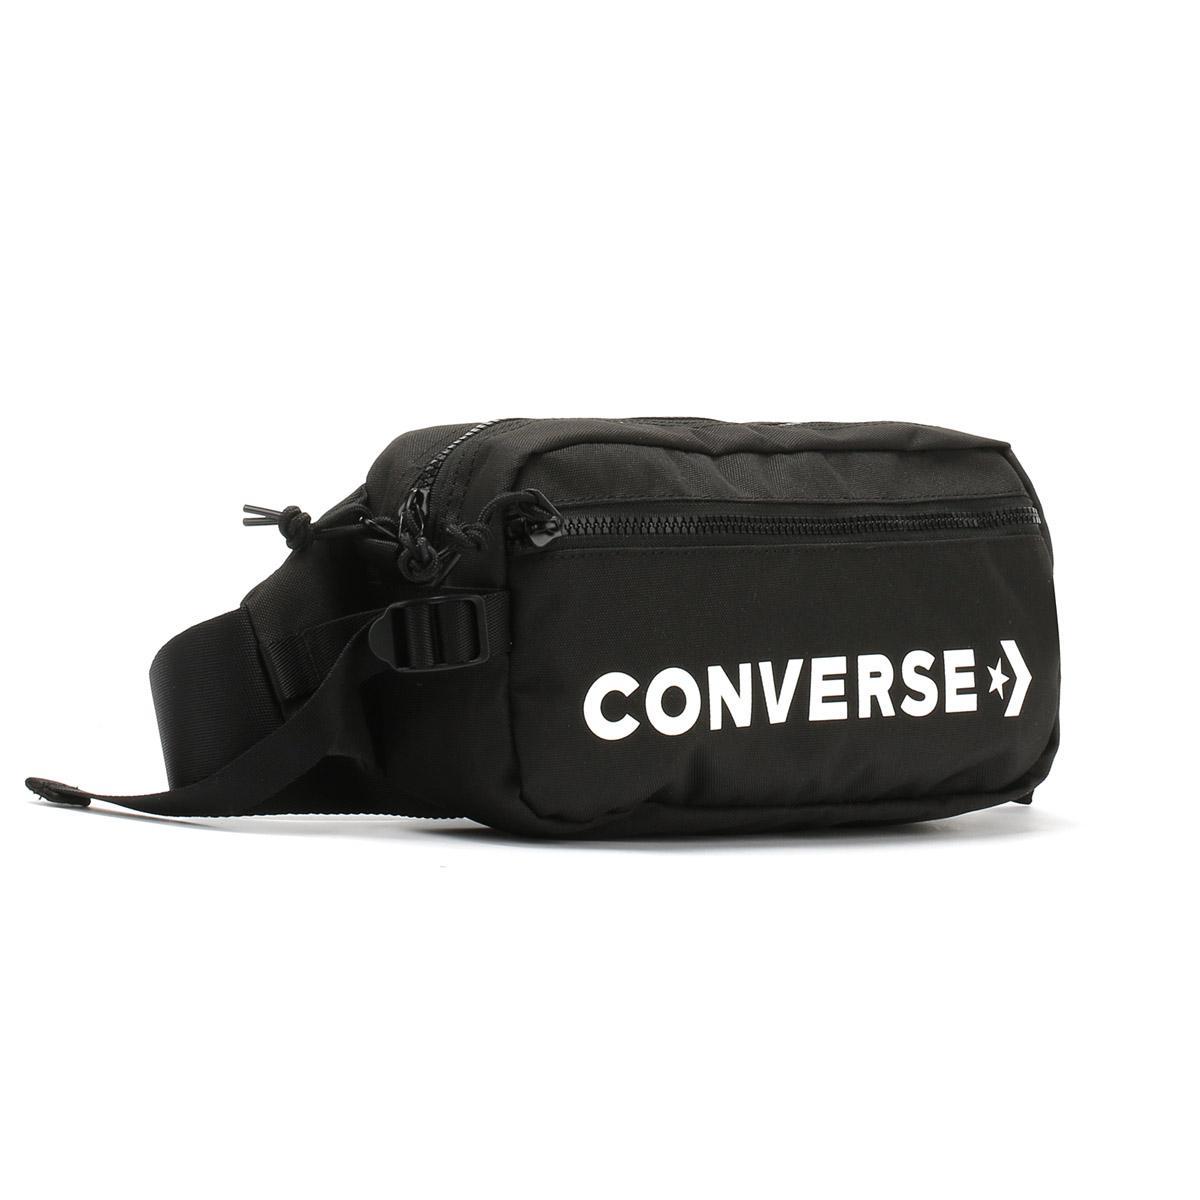 Lyst - Converse Black   White Fast Pack Sling Bag in Black for Men 26775cc526